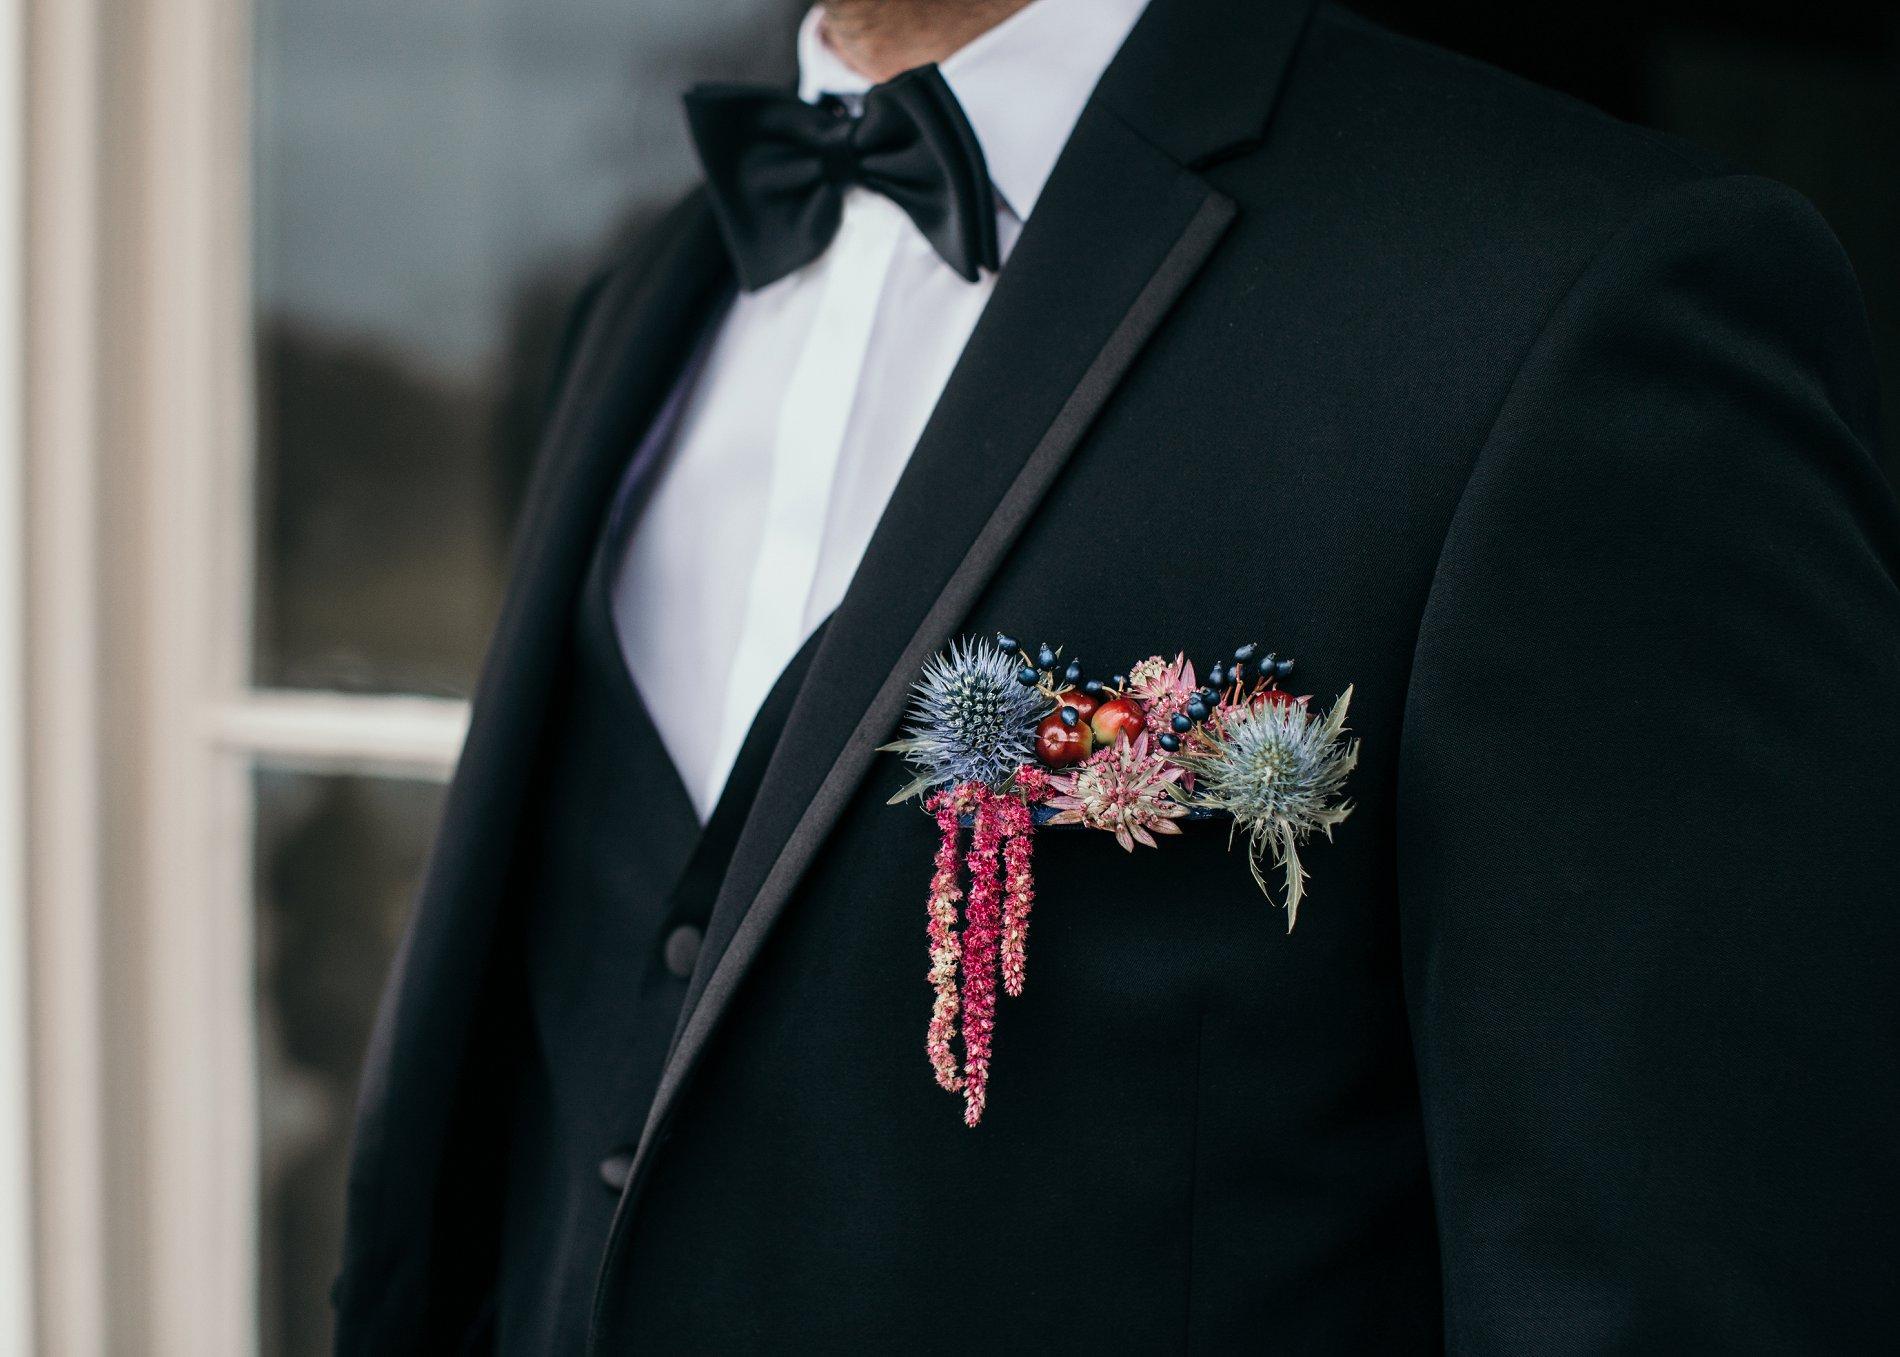 A Black Tie Wedding Creative Shoot at Saltmarshe Hall (c) Natalie Hamilton Photography (4)